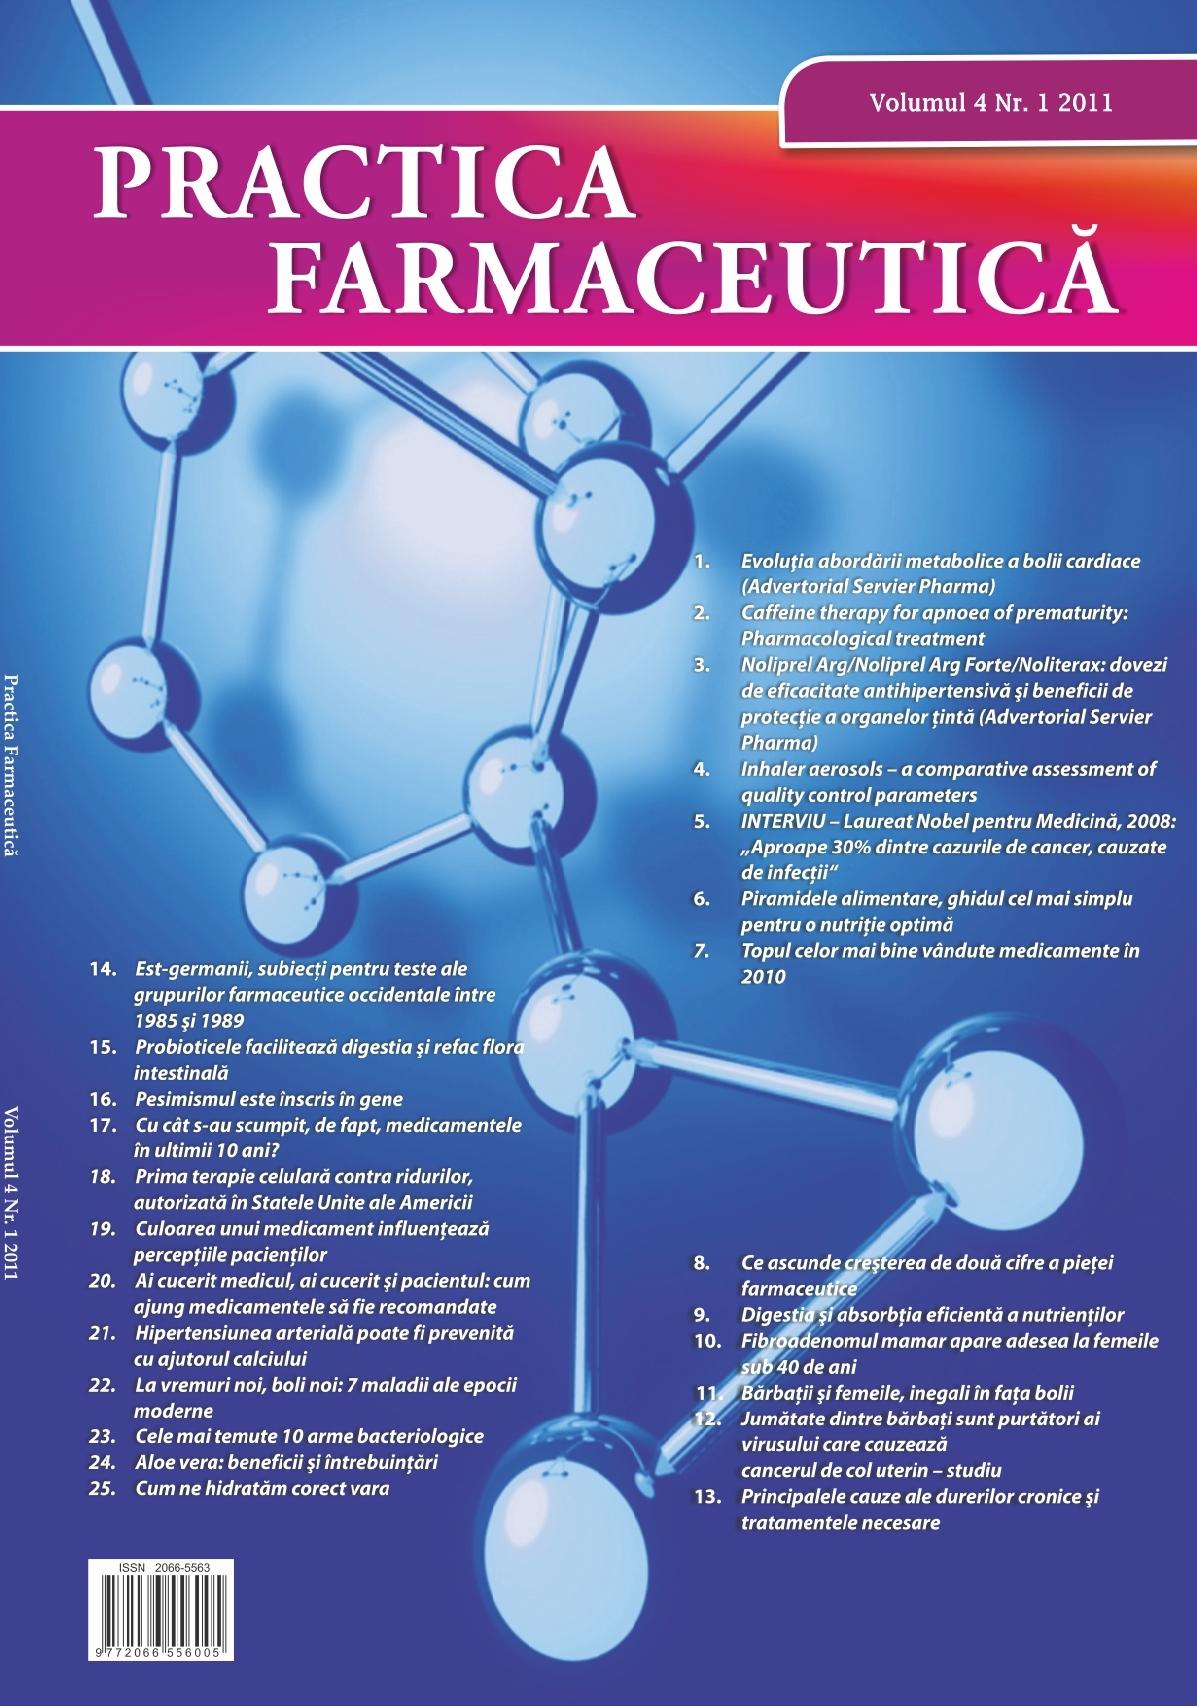 Revista Practica Farmaceutica, Vol. IV, No. 1 (9), 2011